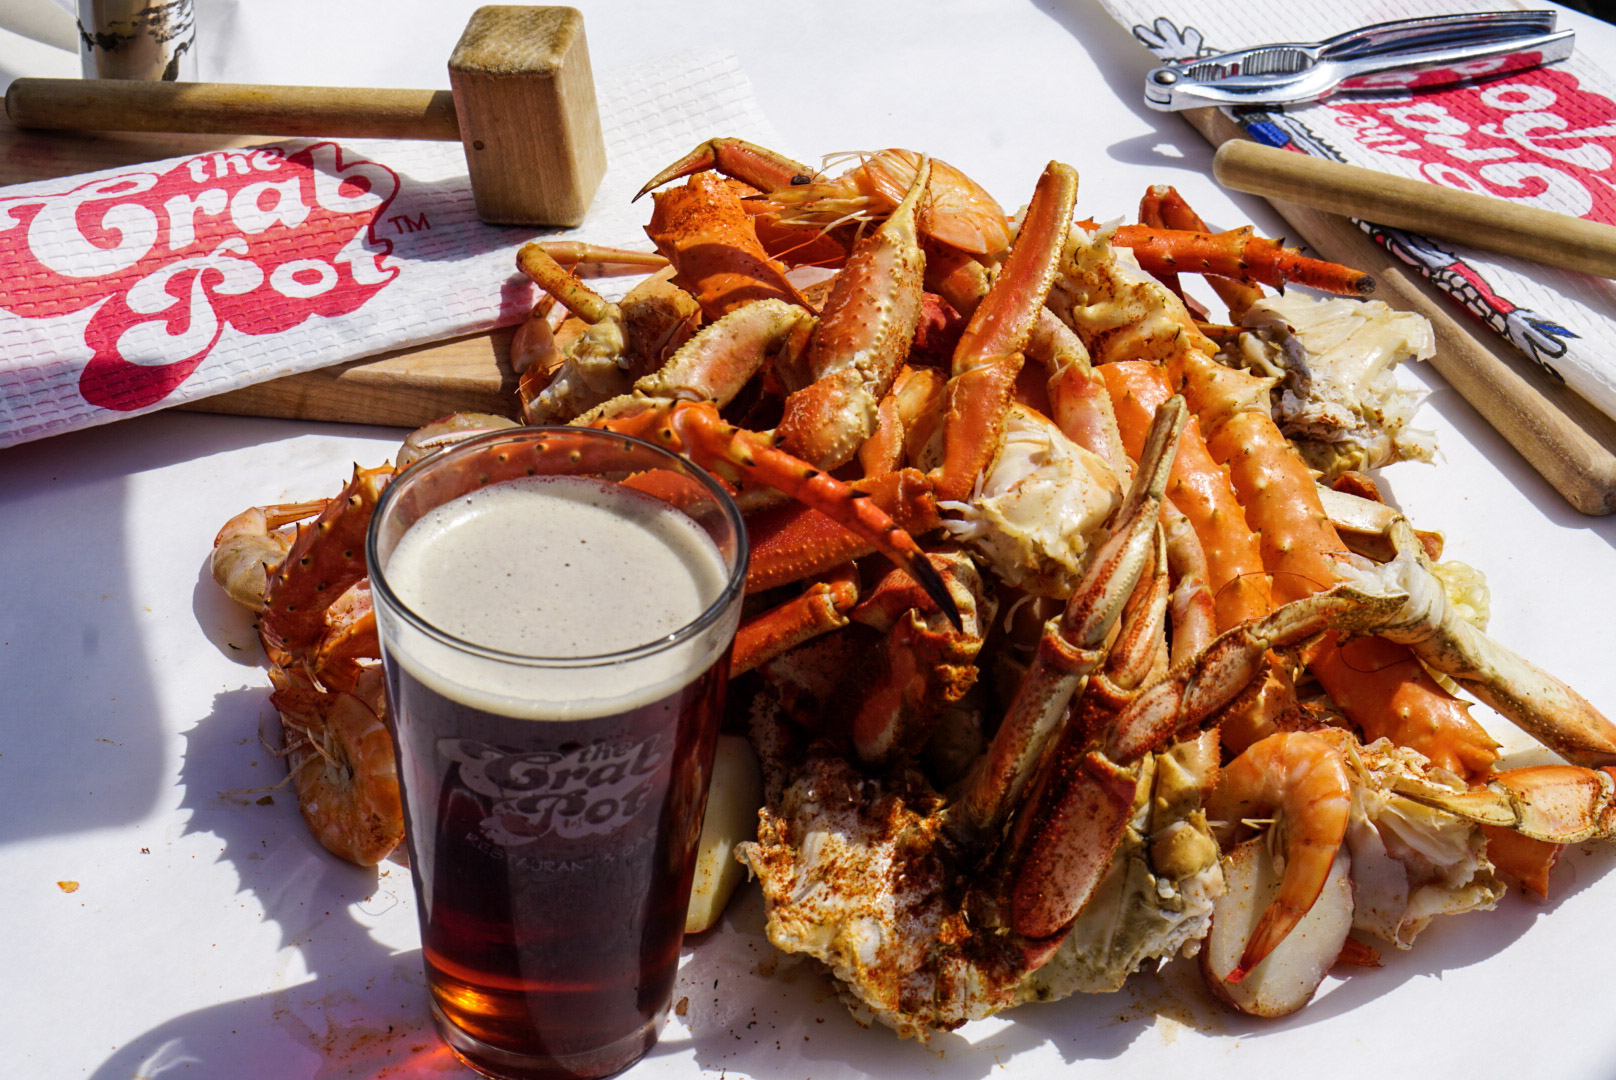 Royal_Crab_Feast_12.jpg